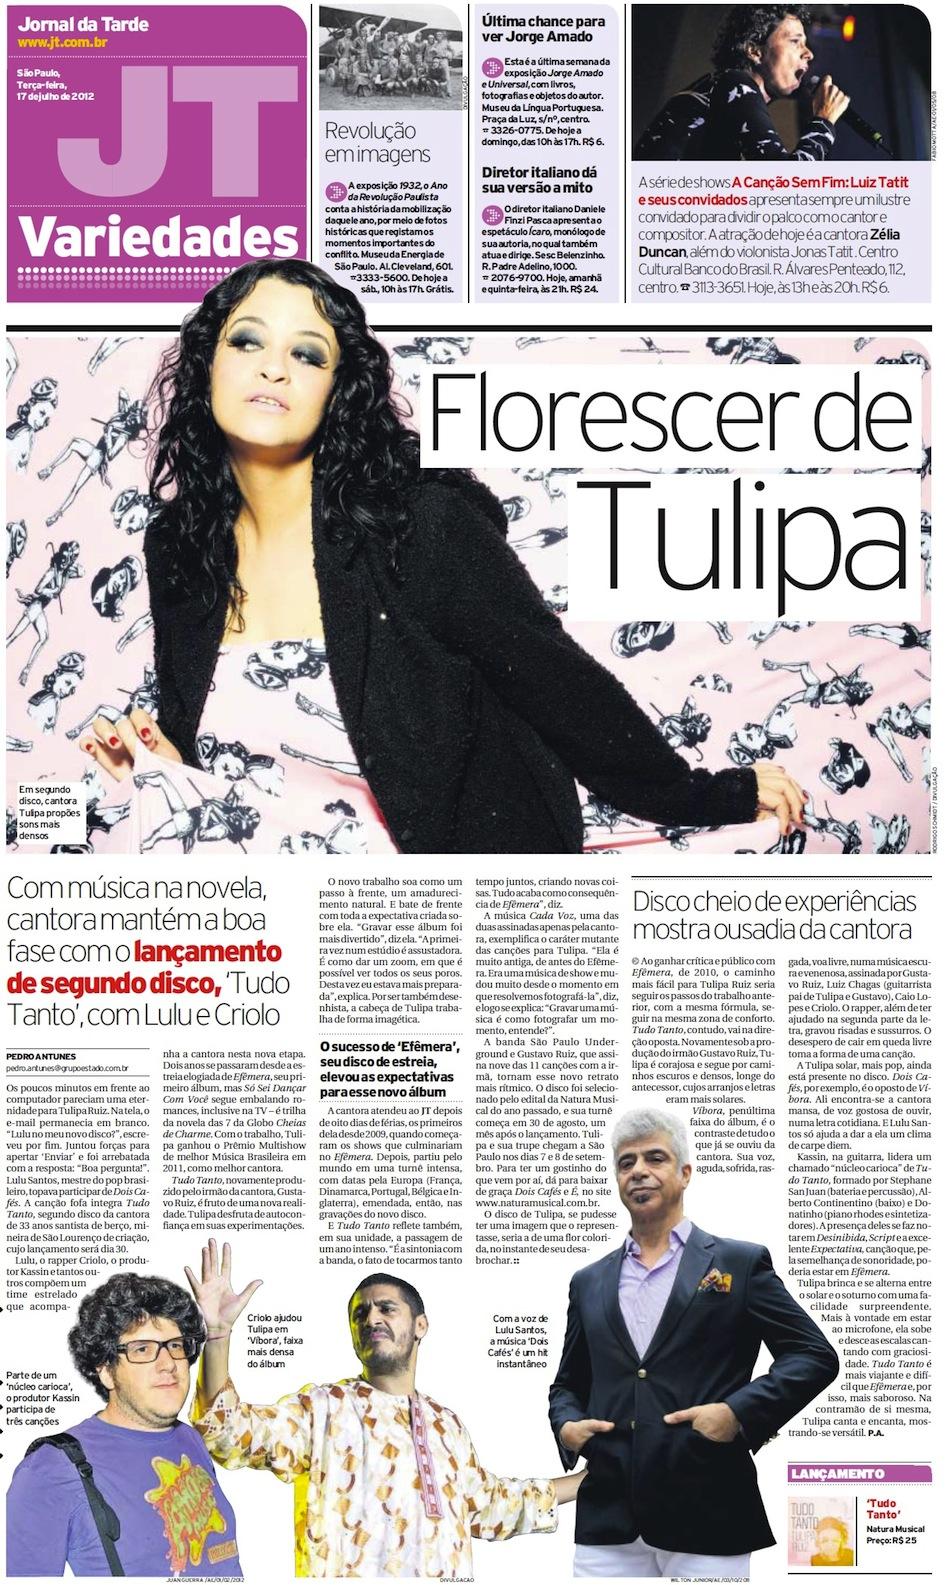 Tulipa-Tudo-Tanto-capa-JT.jpg